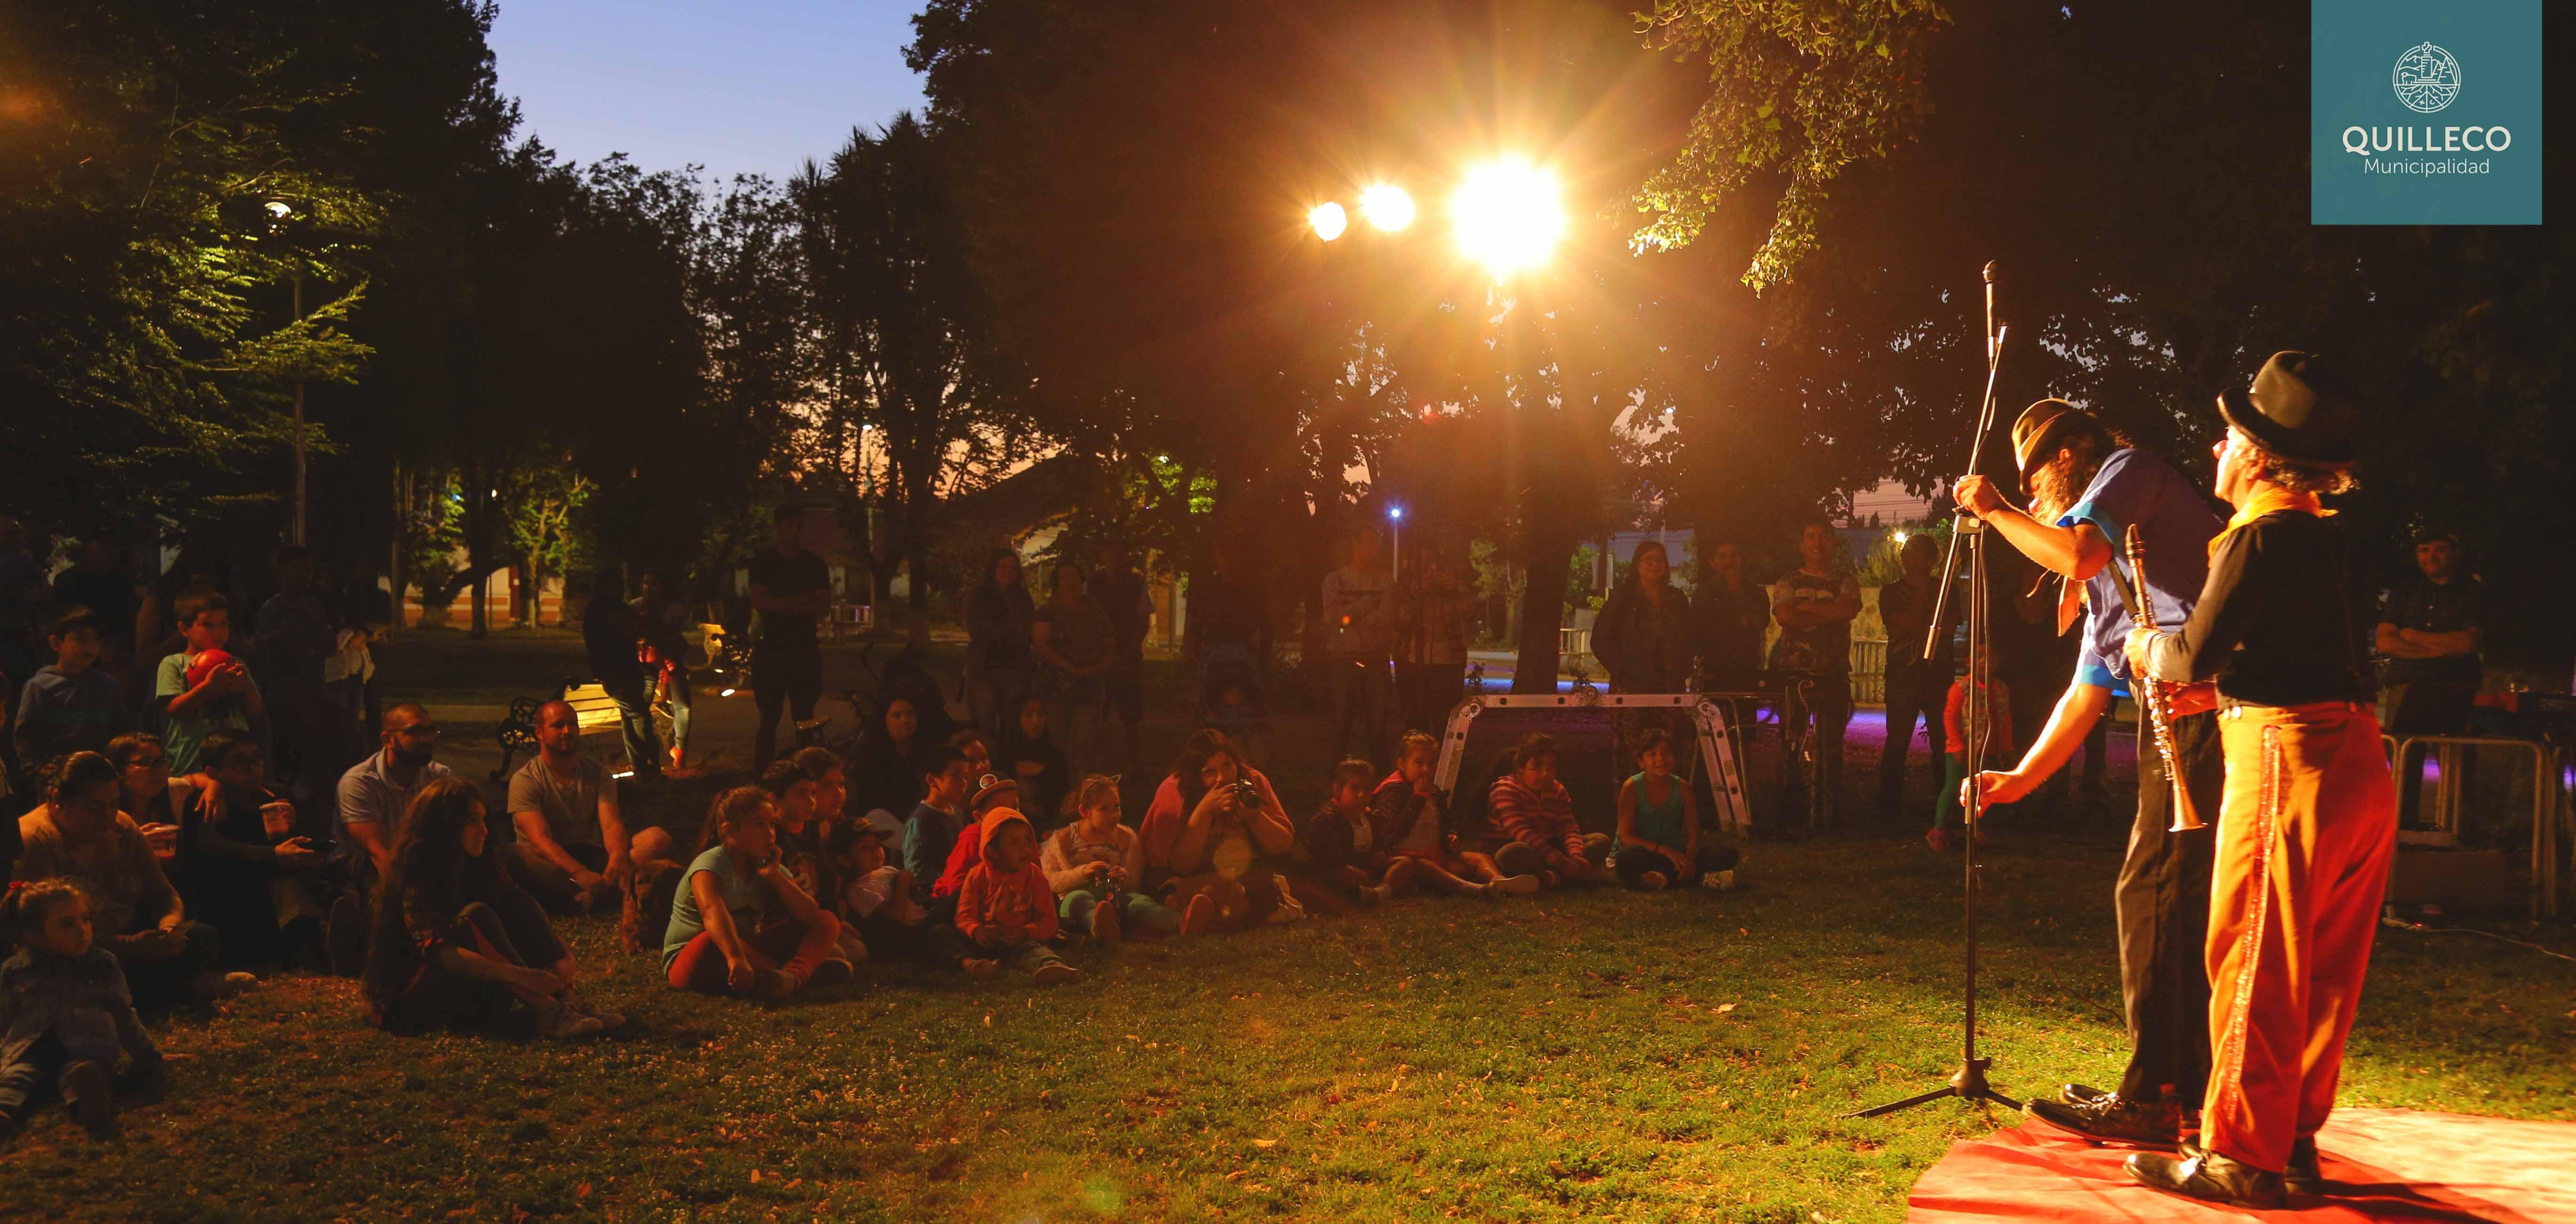 Obra de teatro al aire libre se realizó en Plaza de Armas de Quilleco